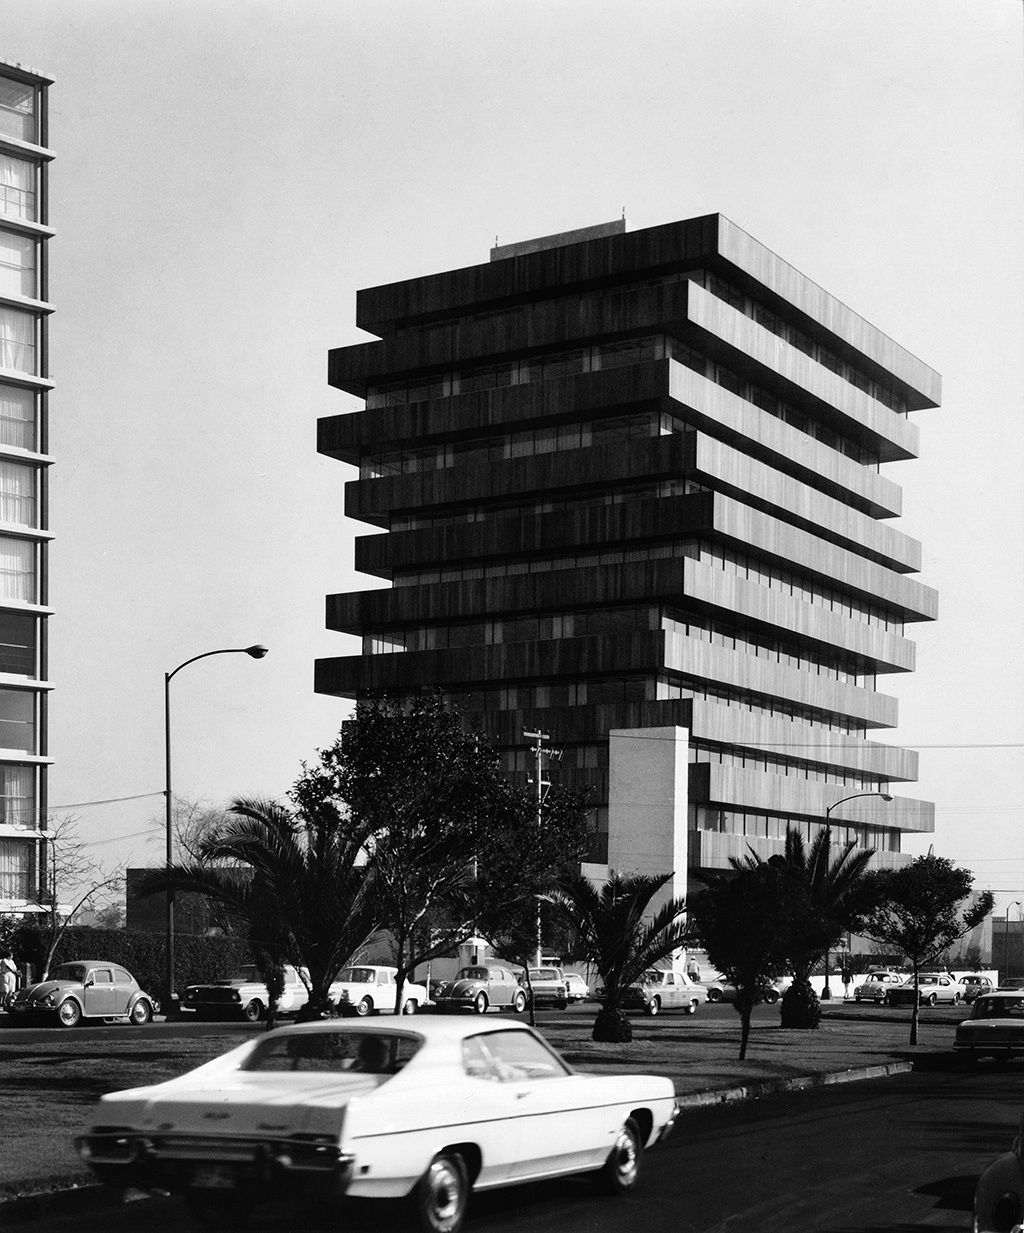 Central de arquitectura a mexico city based design studio has - Galer A Cl Sicos De Arquitectura Palmas 555 Sordo Madaleno Arquitectos 4 Mexico City1975modernismi